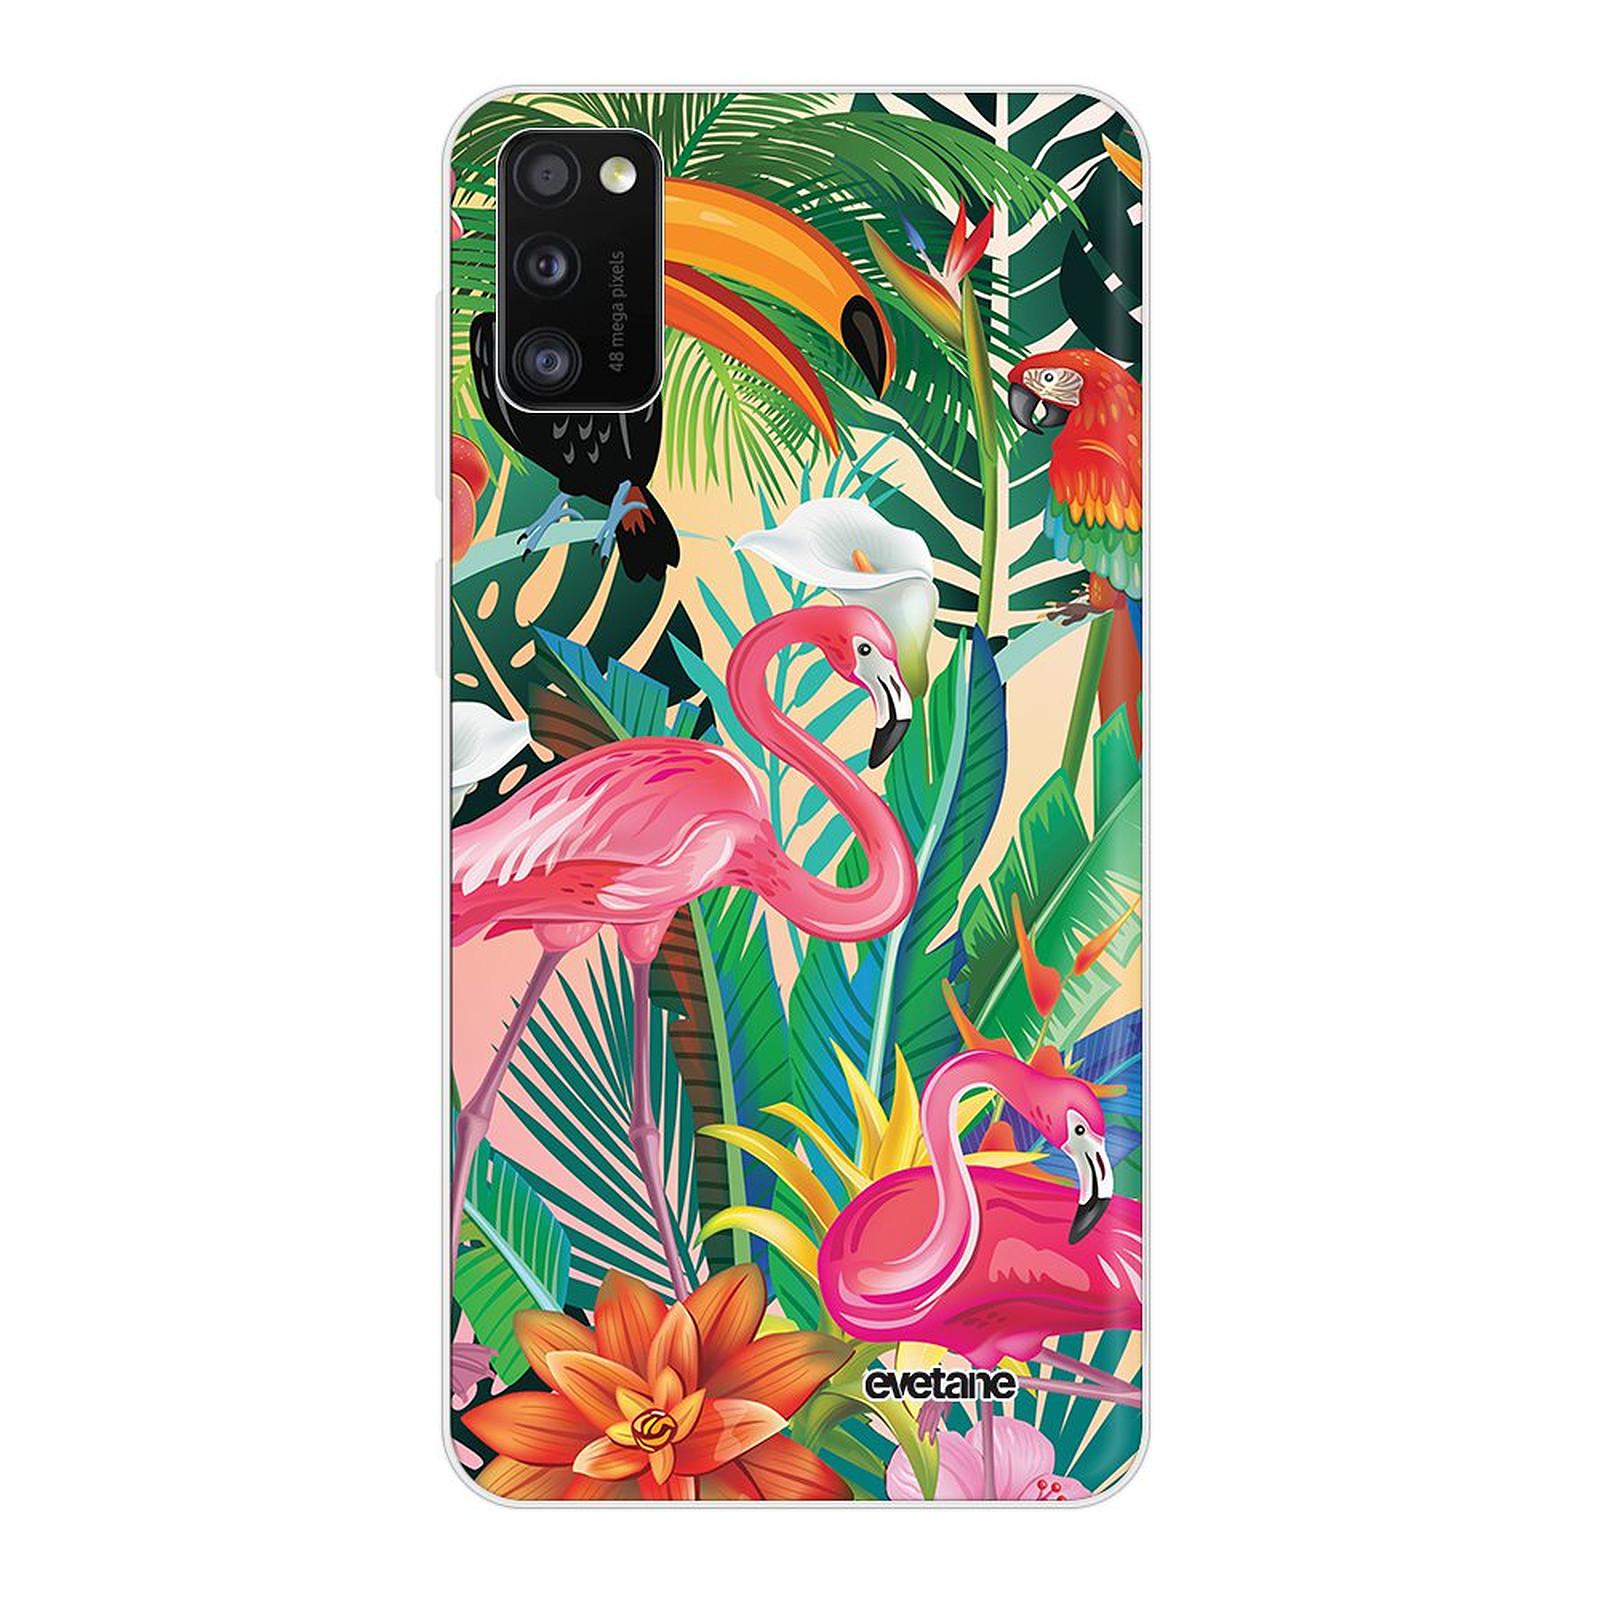 EVETANE Coque Samsung Galaxy A41 souple transparente Animaux Tropicaux - Coque téléphone Evetane sur LDLC